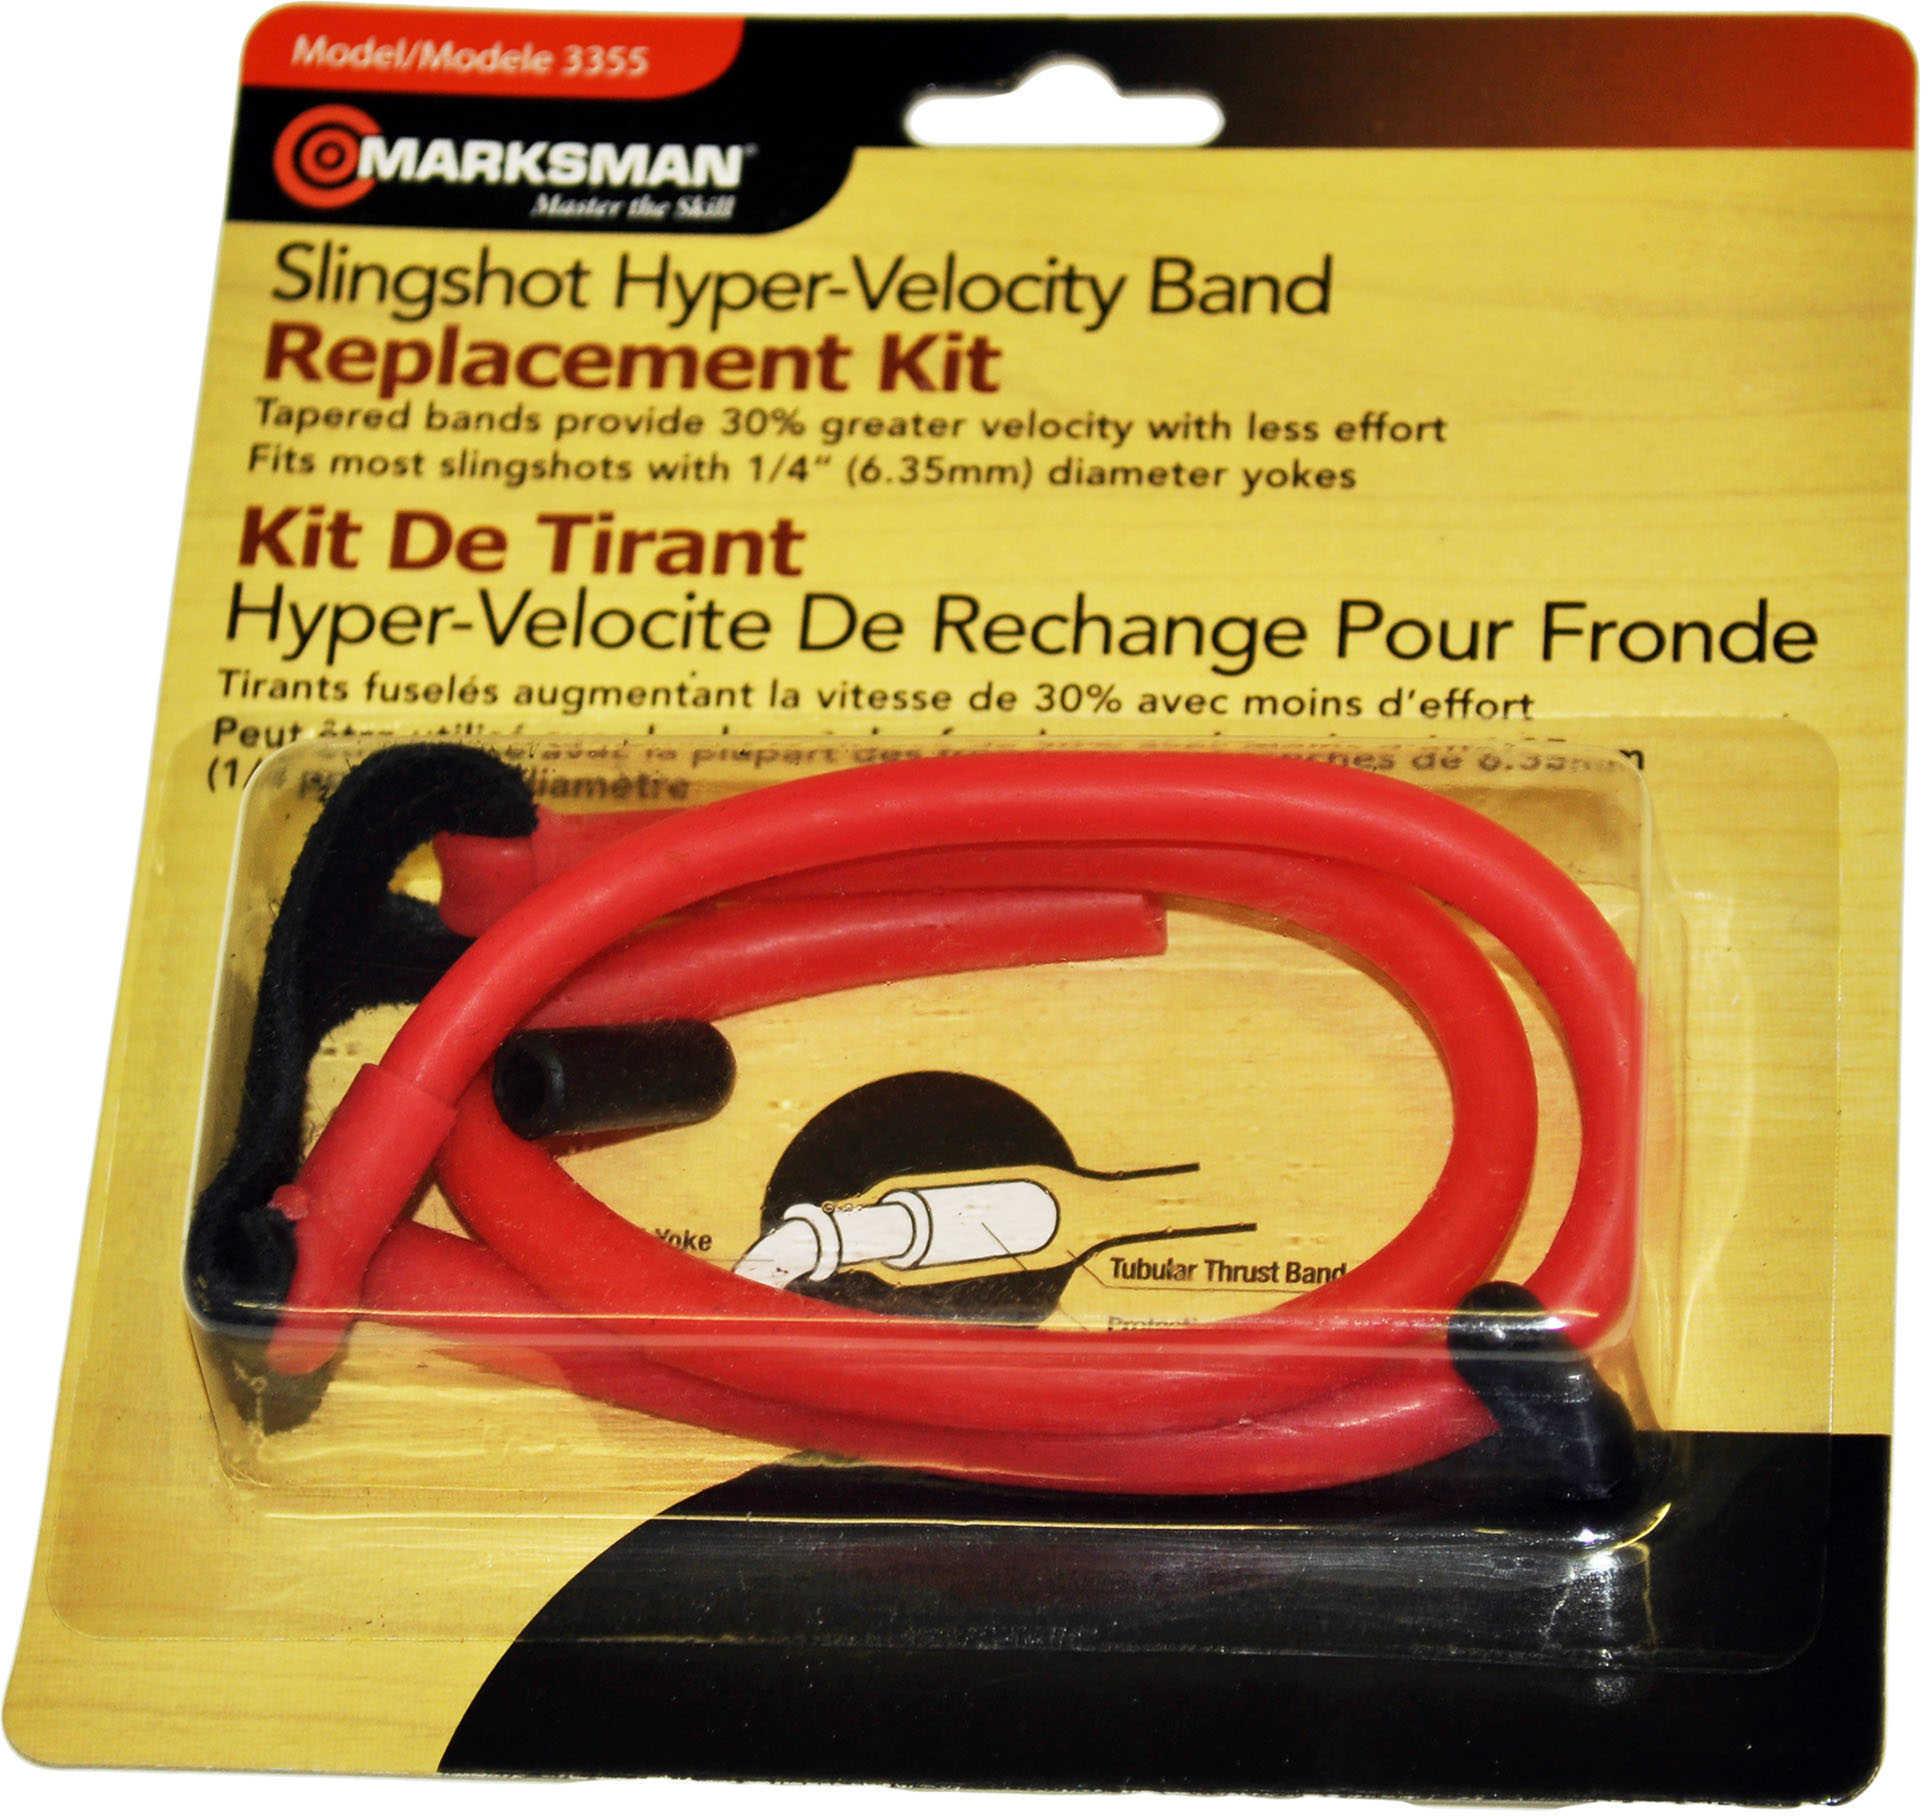 Laserhawk Talon Grip Replacement Band Kit Md: 3355